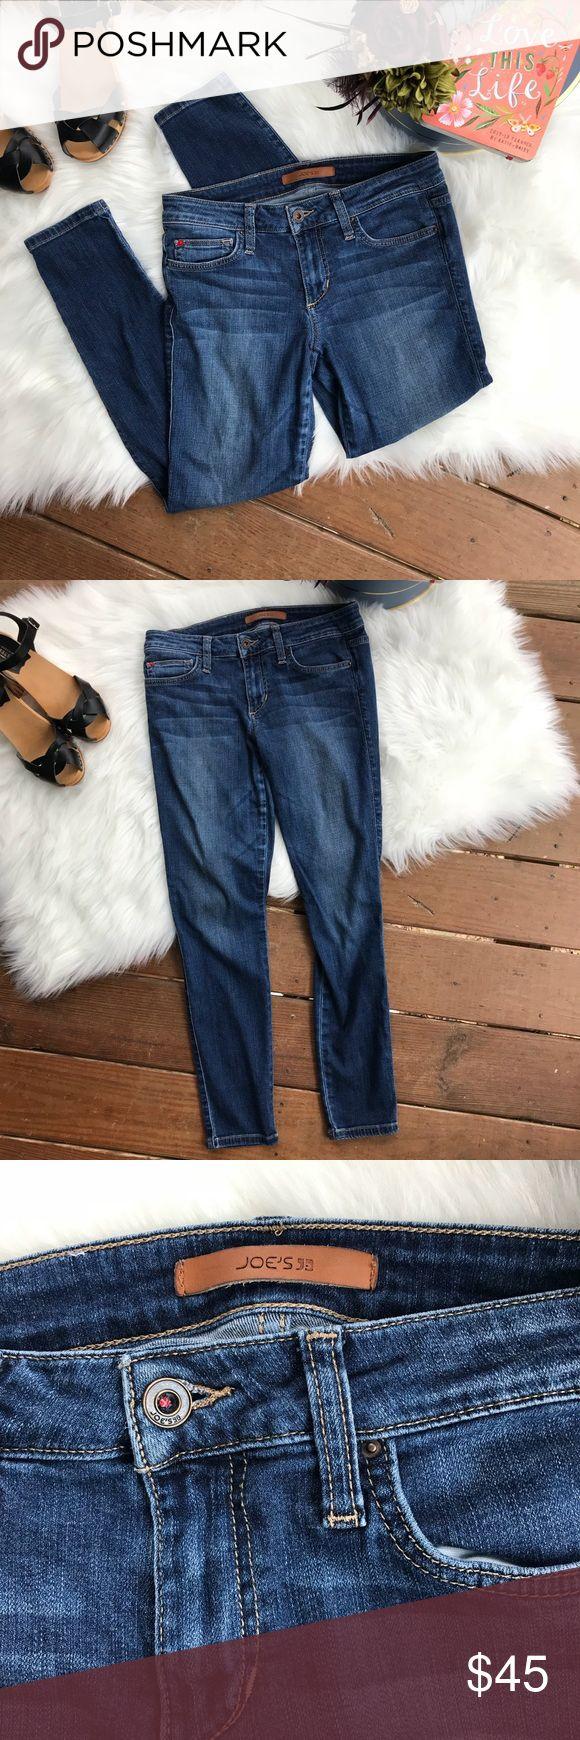 "Joe's Jeans The Vixen Ankle Joe's Jeans. The Vixen Ankle. Size 27. Waist - 30"" Rise - 8"" Inseam - 27"". Joe's Jeans Jeans Skinny"